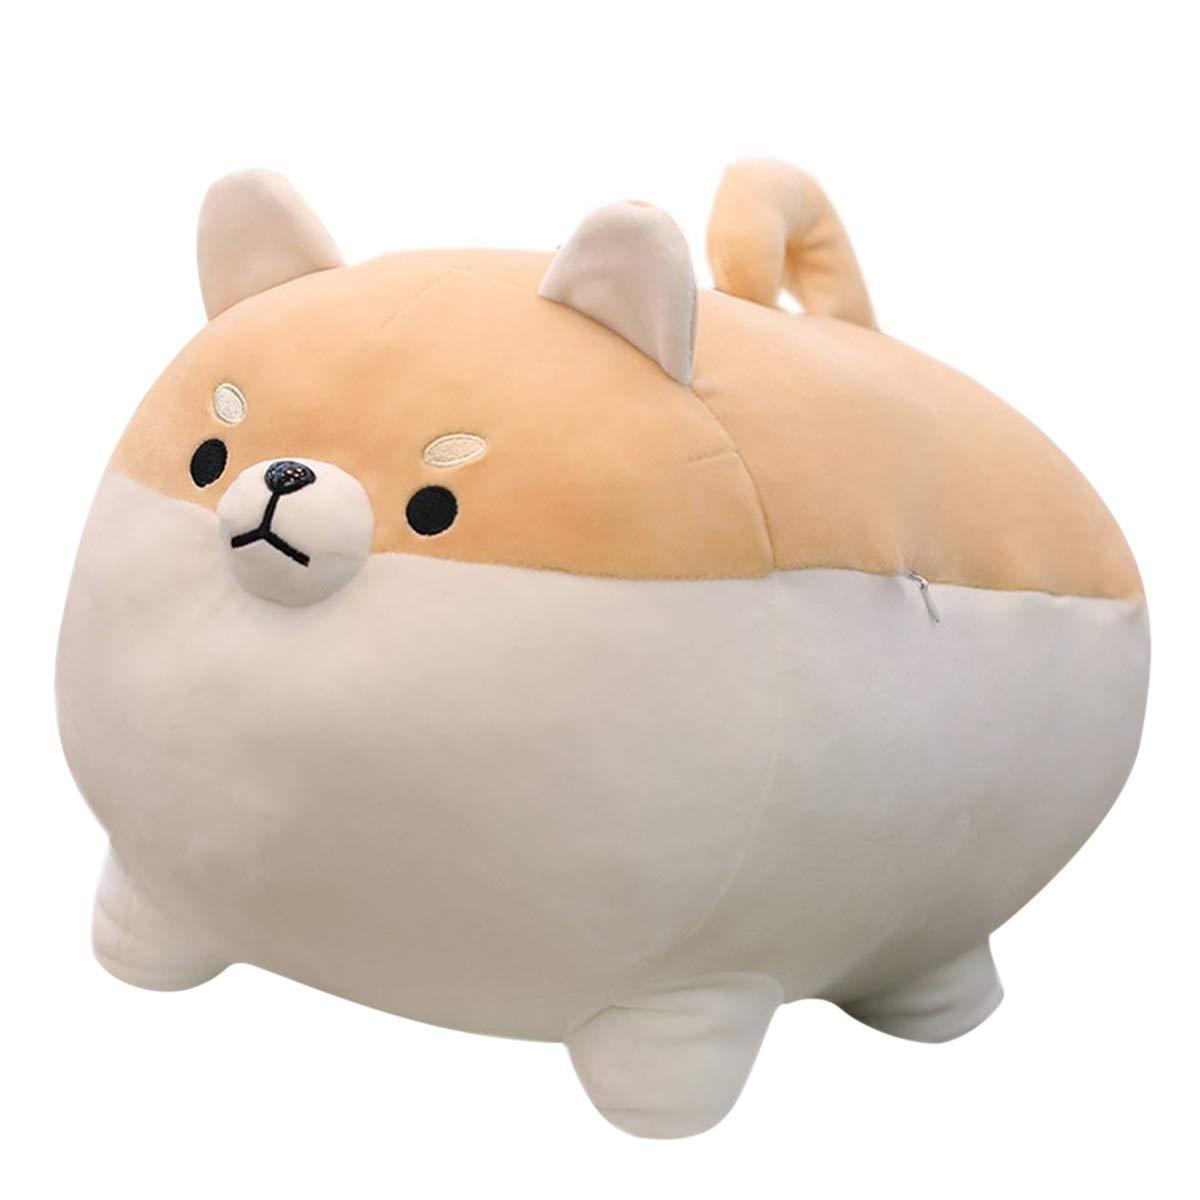 Rose Auroma 16'' Shiba Inu Plush Corgi Plush Stuffed Animal Kawaii Plush Soft Pillow Doll Dog, Dog Plush Toy Gifts for Family, Friends, Kids (Brown) by Rose Auroma